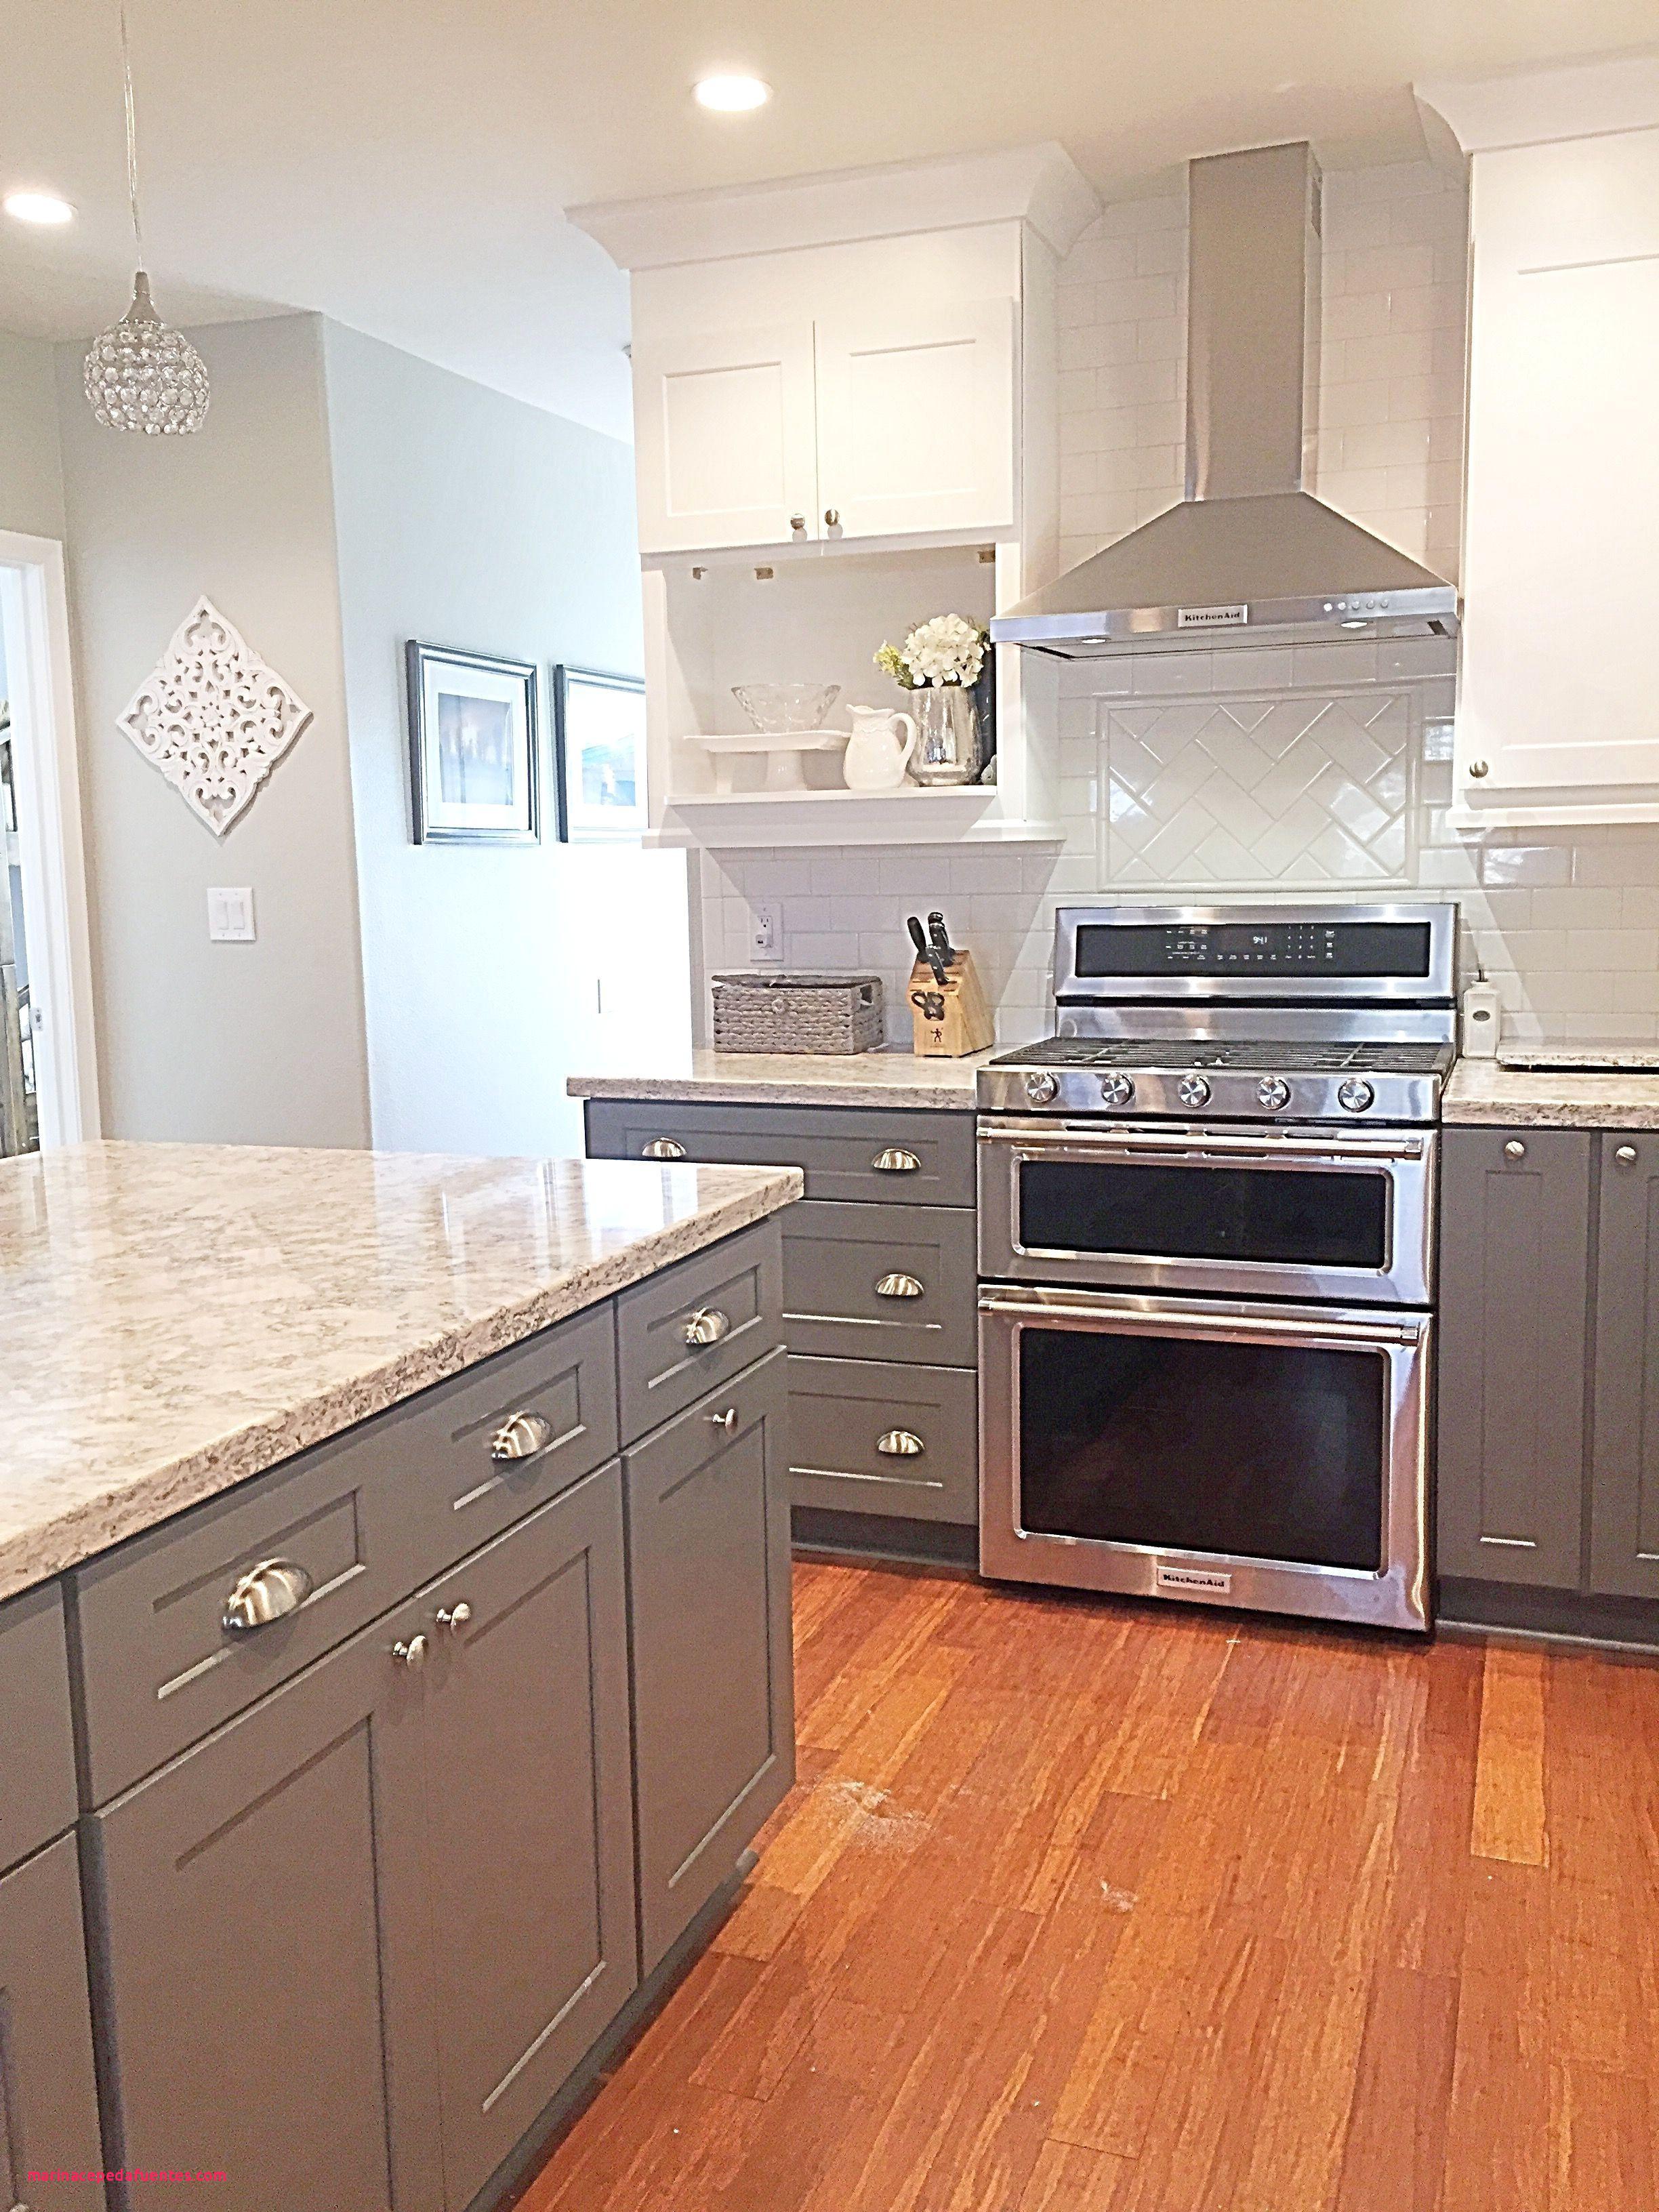 hardwood floor refinishing des moines iowa of luxury installing kitchen cabinets on laminate flooring amazing pertaining to luxury installing kitchen cabinets on laminate flooring